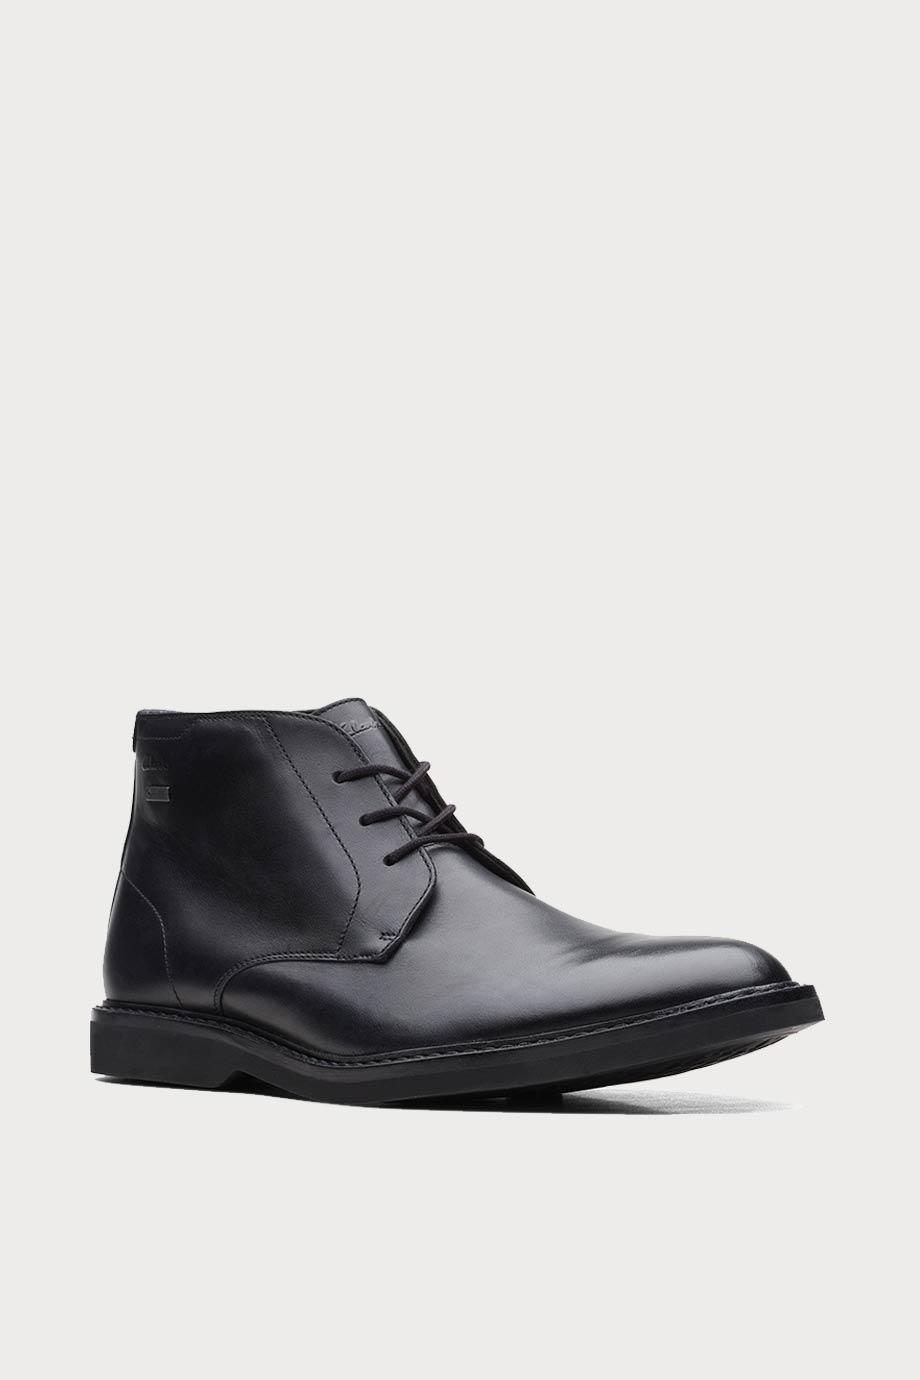 spiridoula metheniti shoes xalkida p AtticusLTHiGTX black leather clarks 2